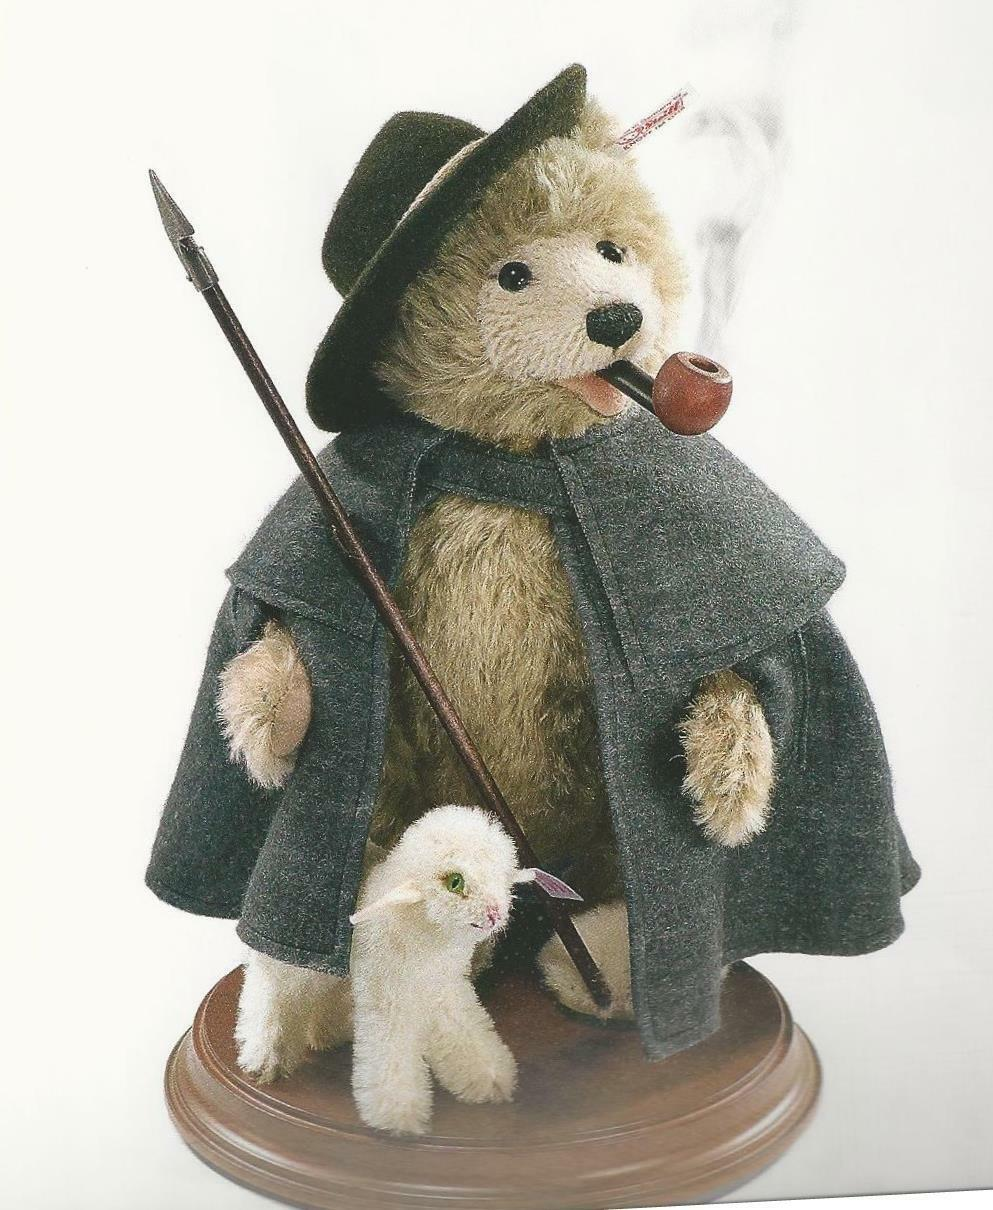 STEIFF  TEDDY BEAR SMOKER BEAR SHEPHERD WITH LAMB  EAN 037153 JOINTED SMOKER